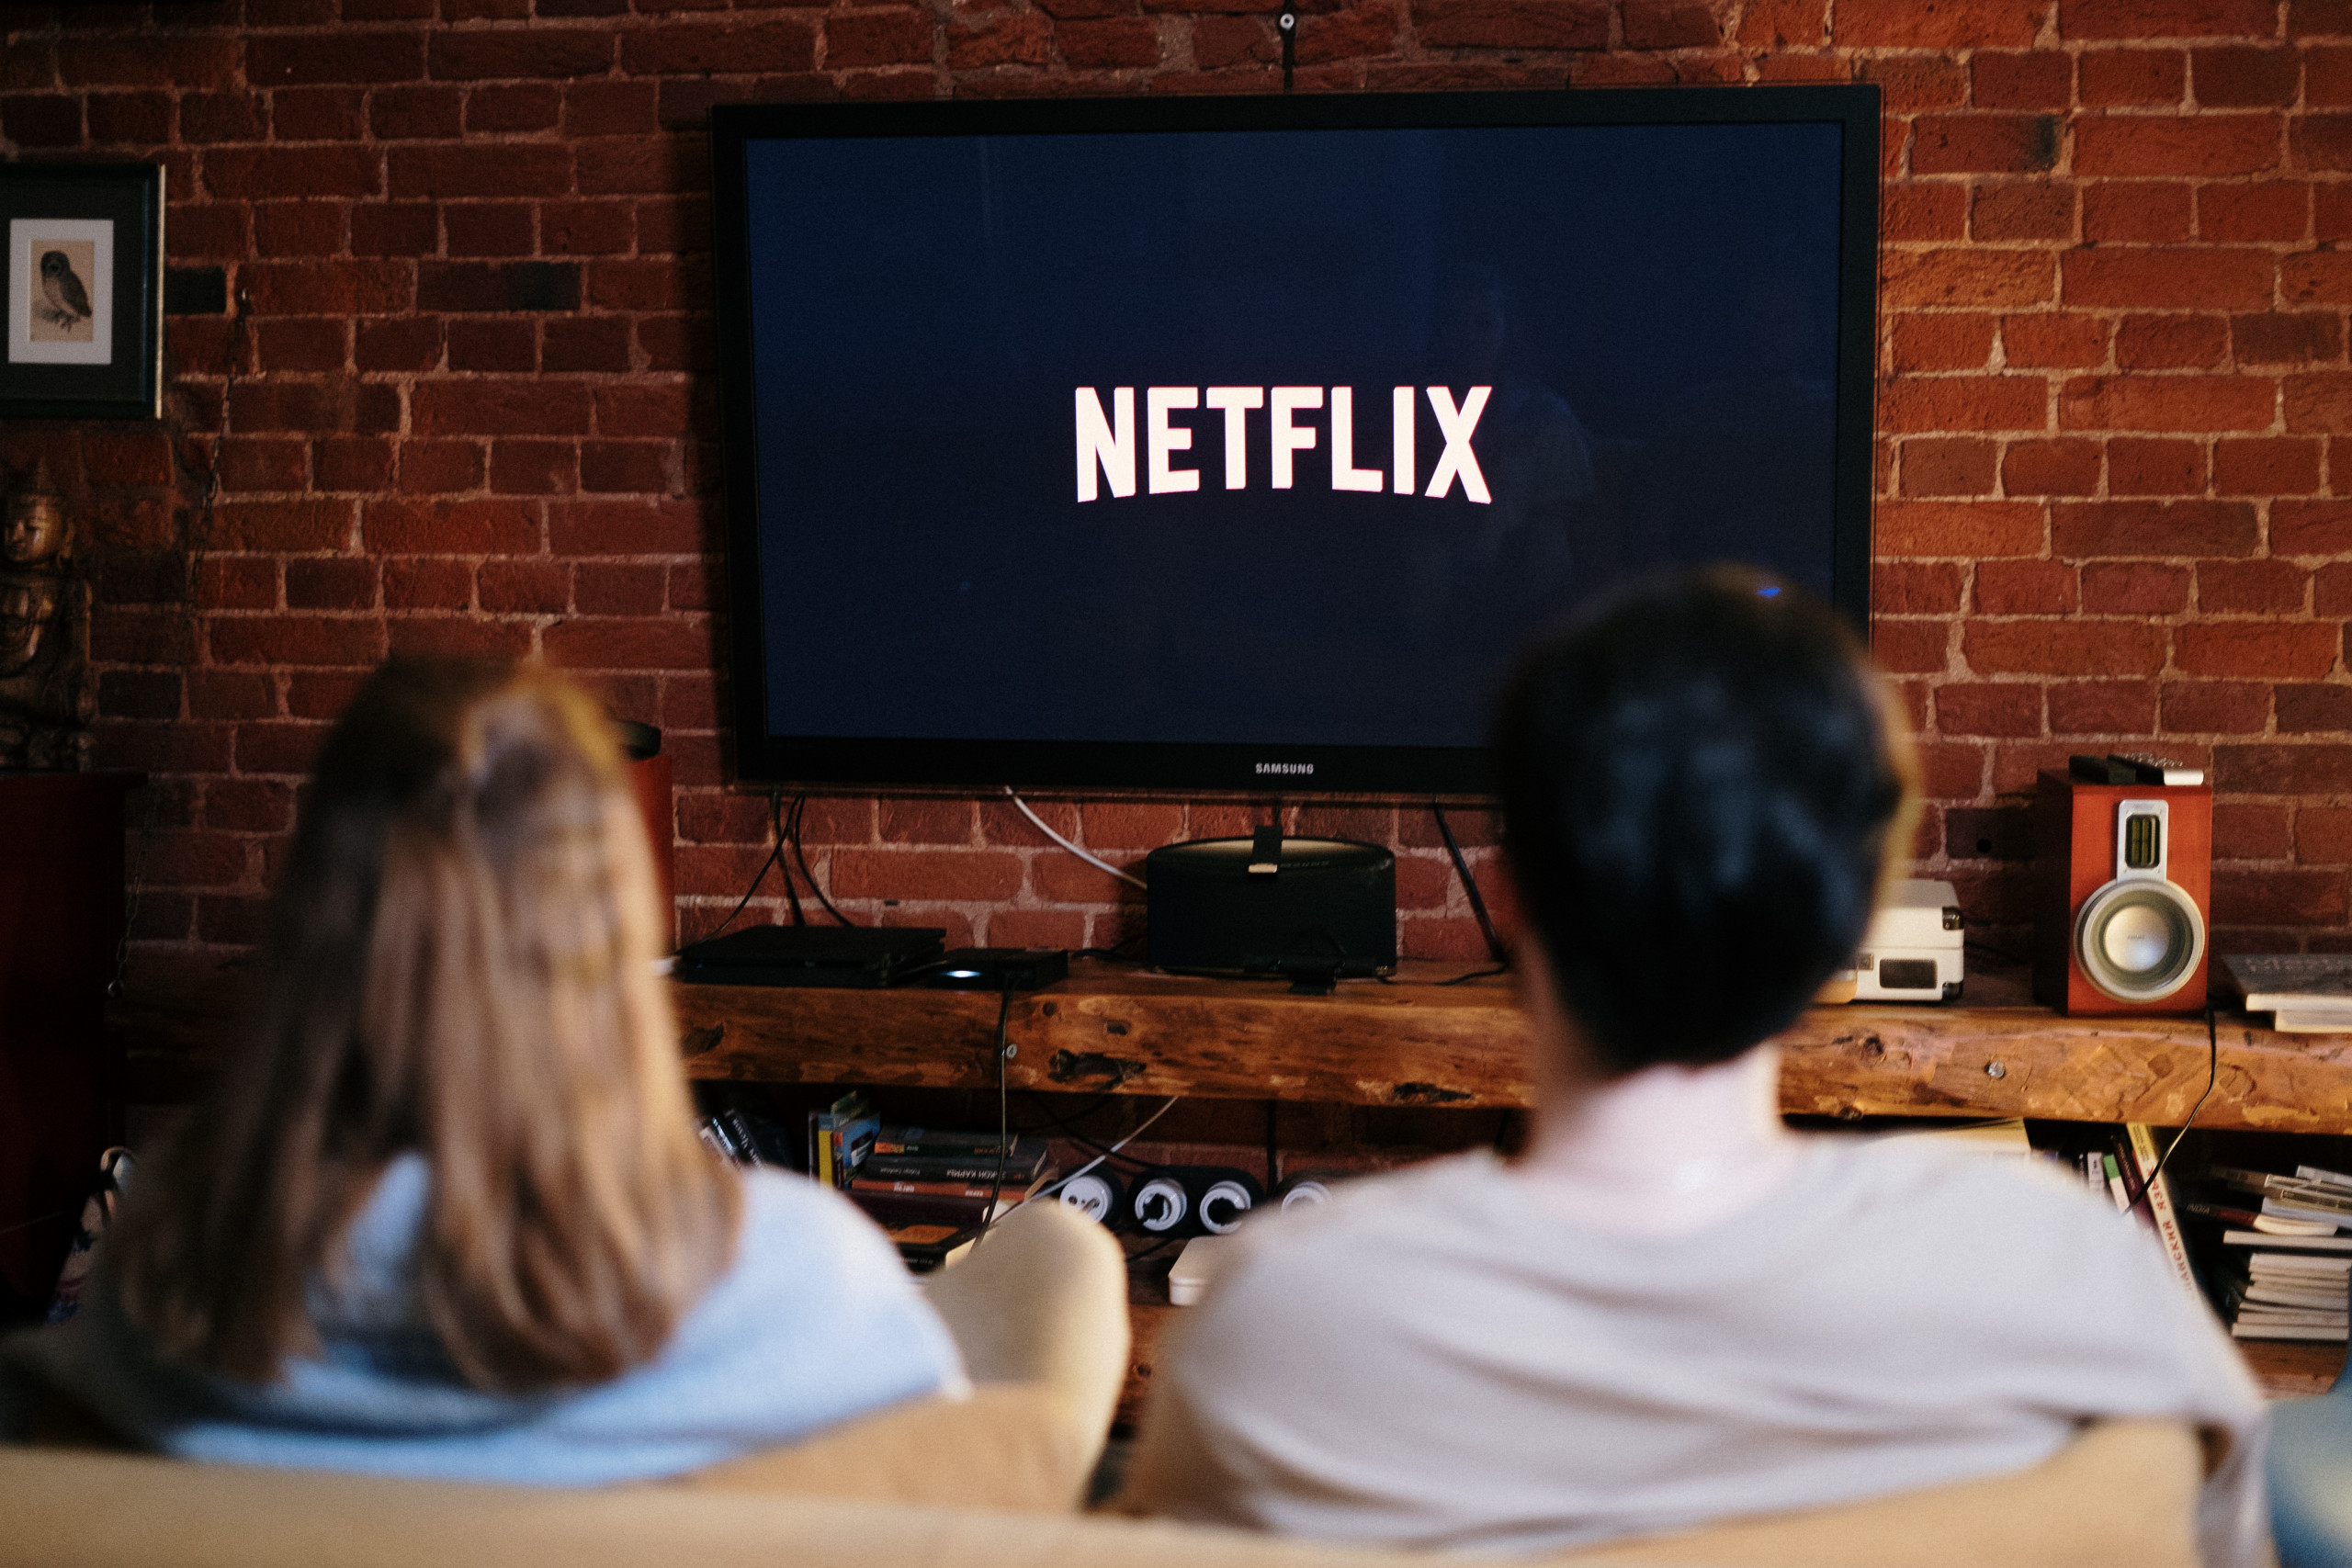 Zwei Personen schauen Netflix